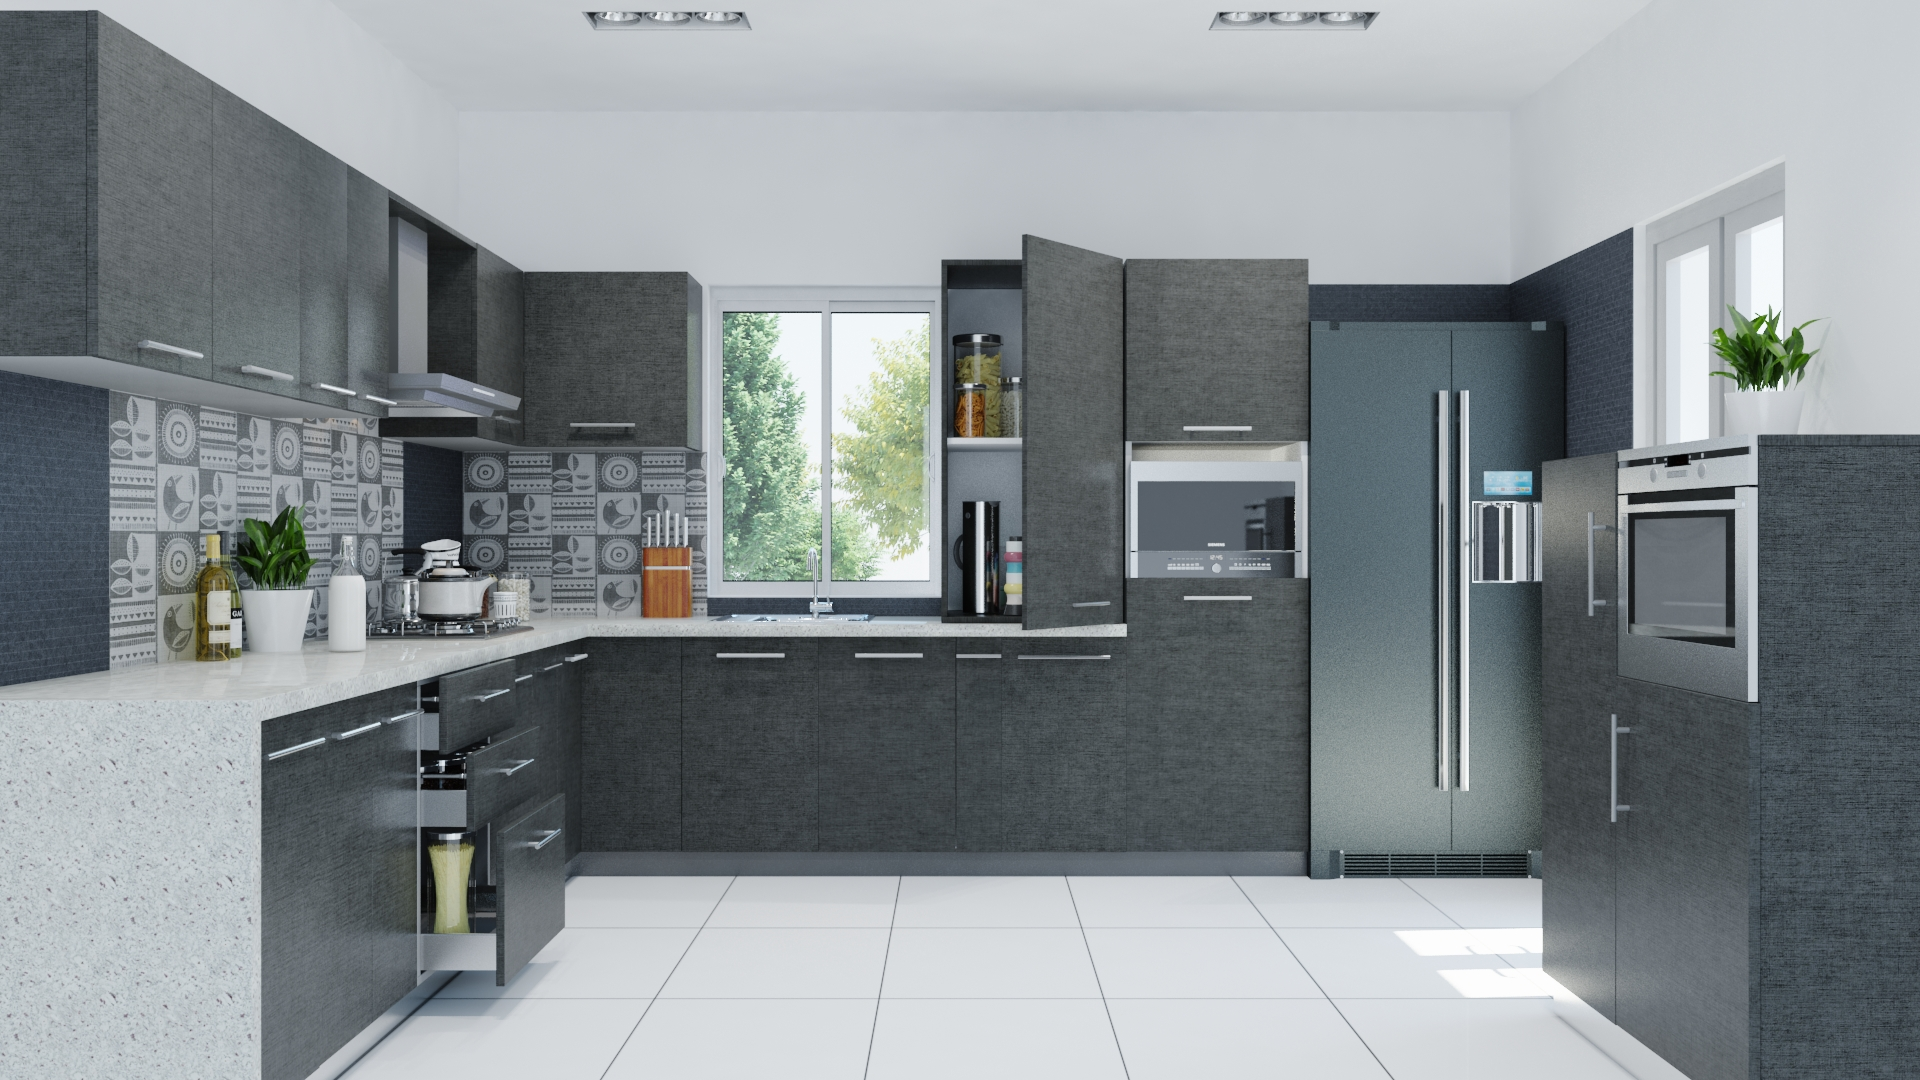 Kitchen Design Trends | Two Tone Color Schemes | Interior ...